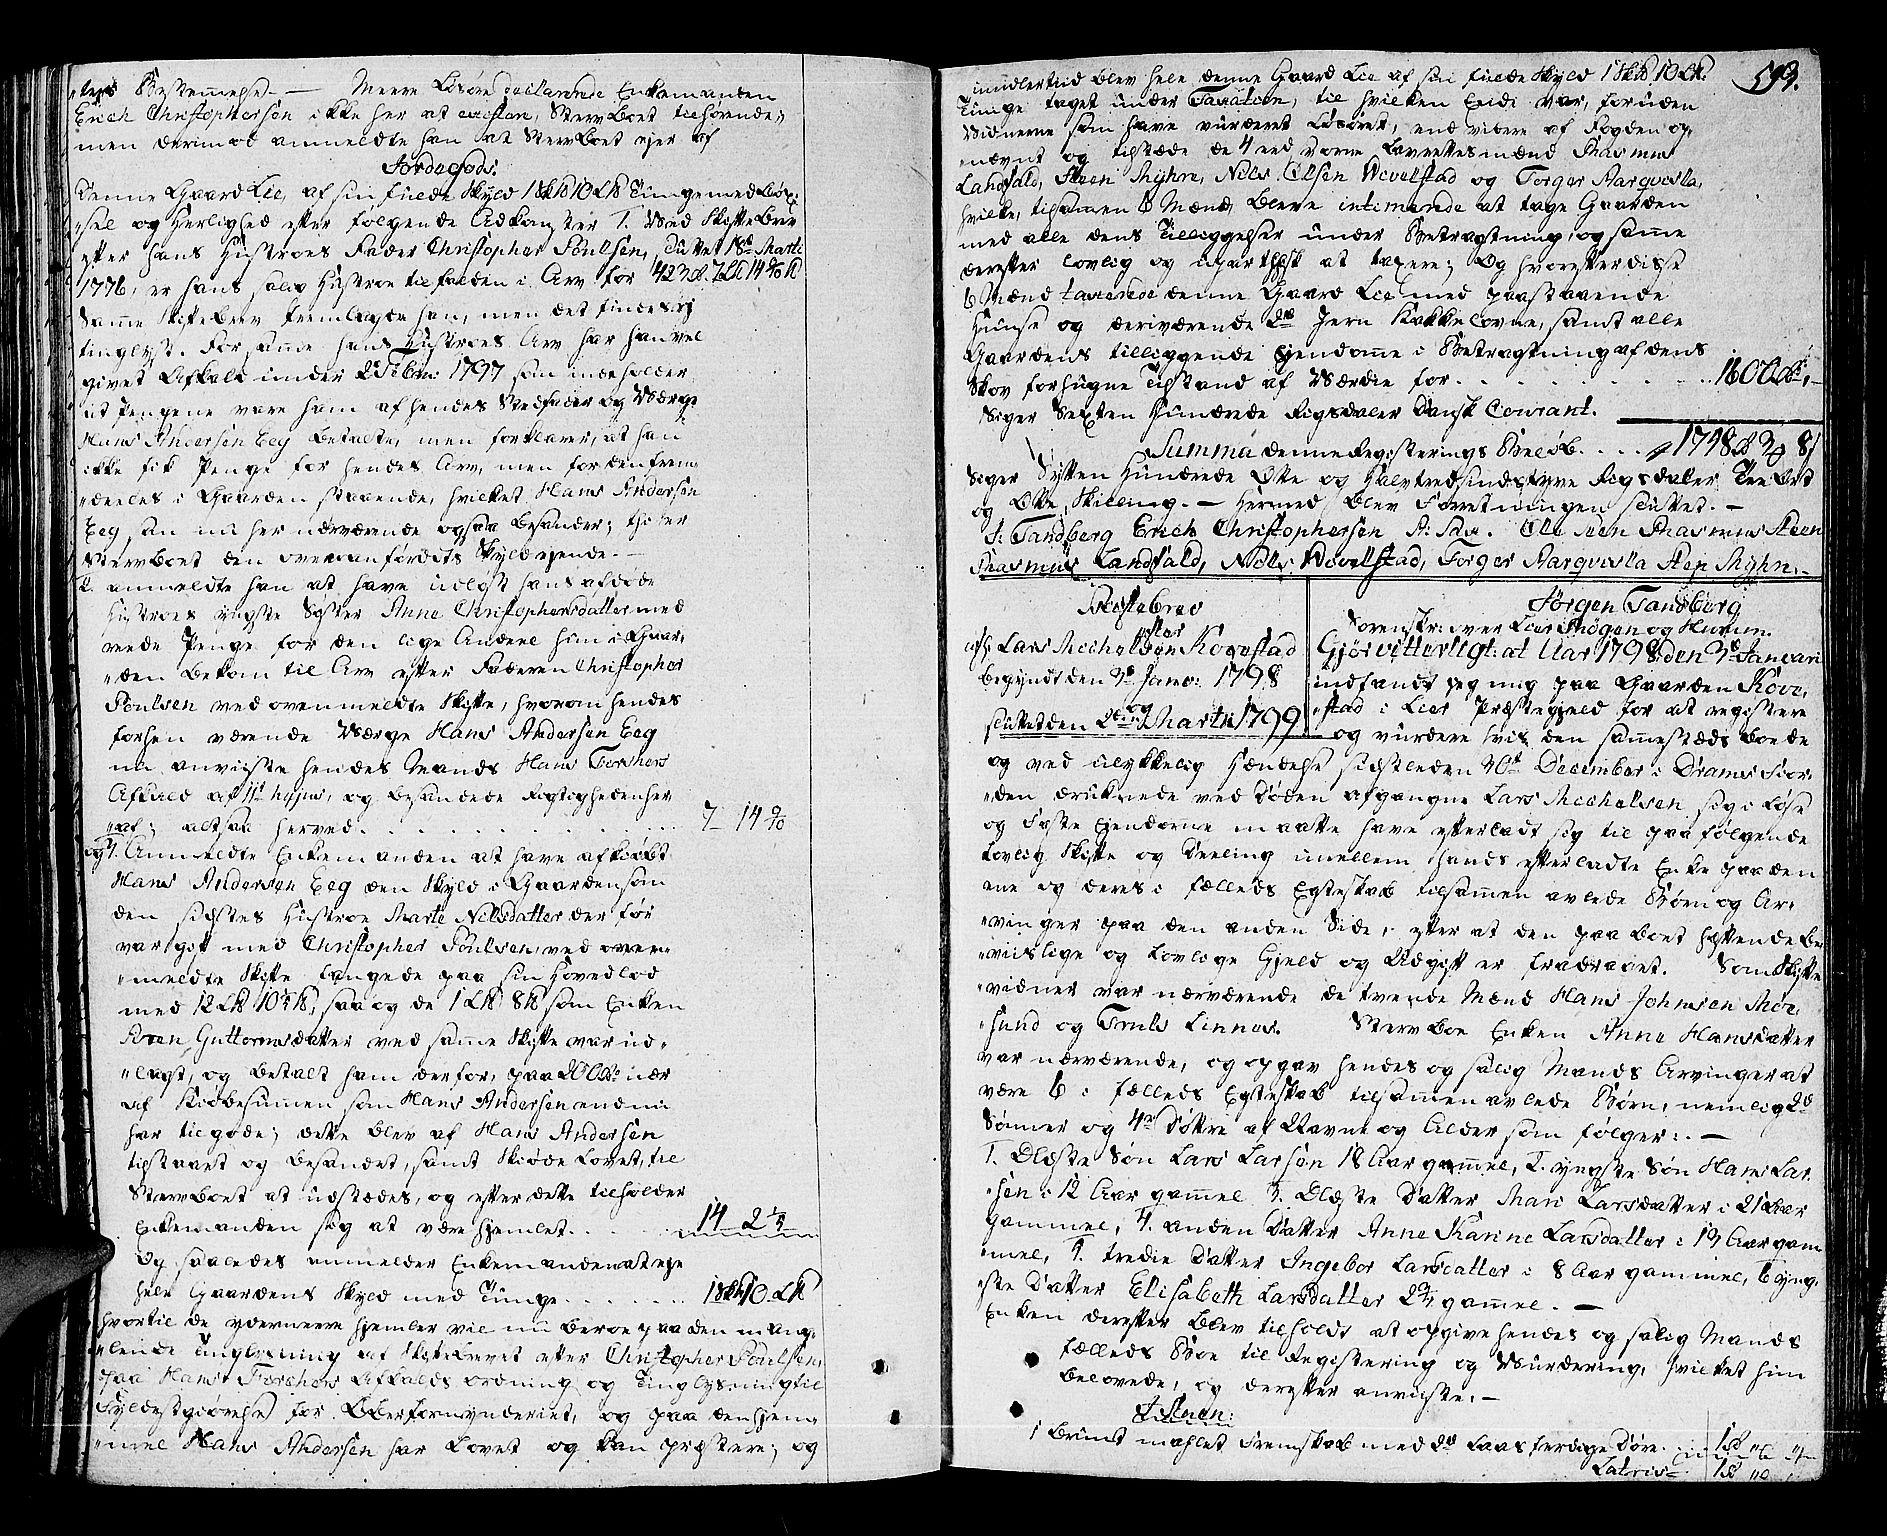 SAKO, Lier, Røyken og Hurum sorenskriveri, H/Hc/L0007a: Skifteprotokoll, 1789-1799, s. 592b-593a